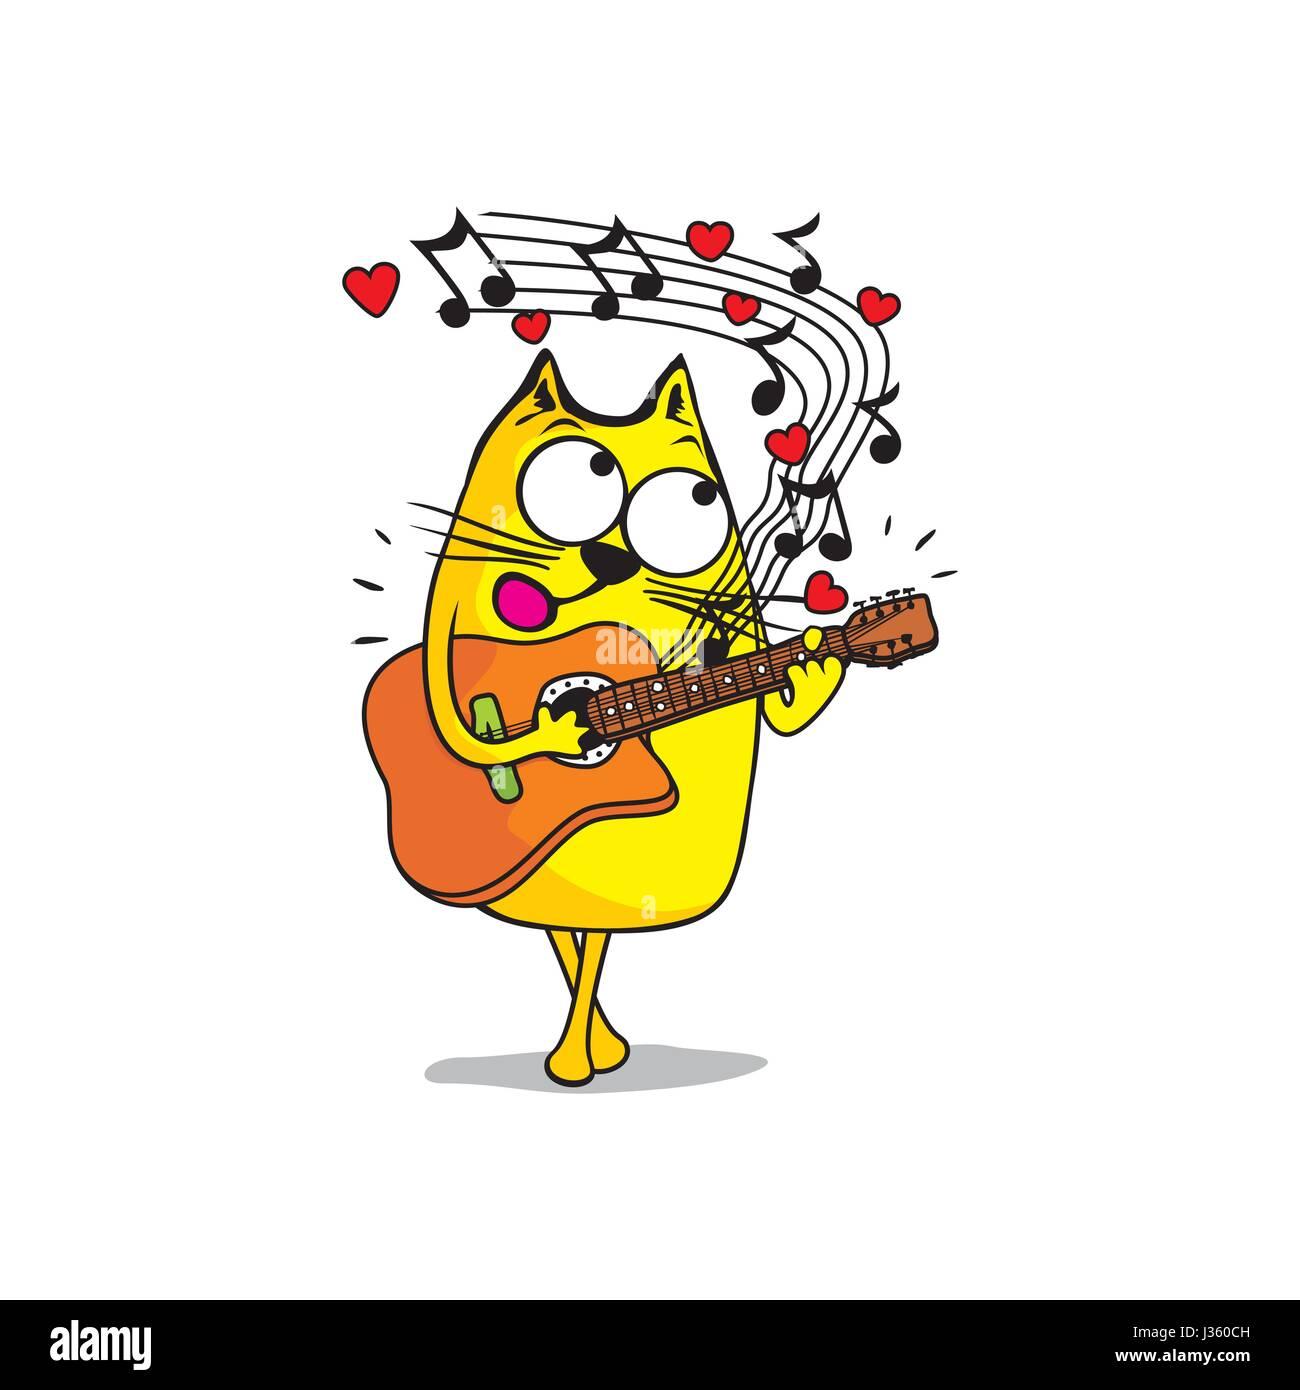 The cat sings a love serenade - Stock Vector